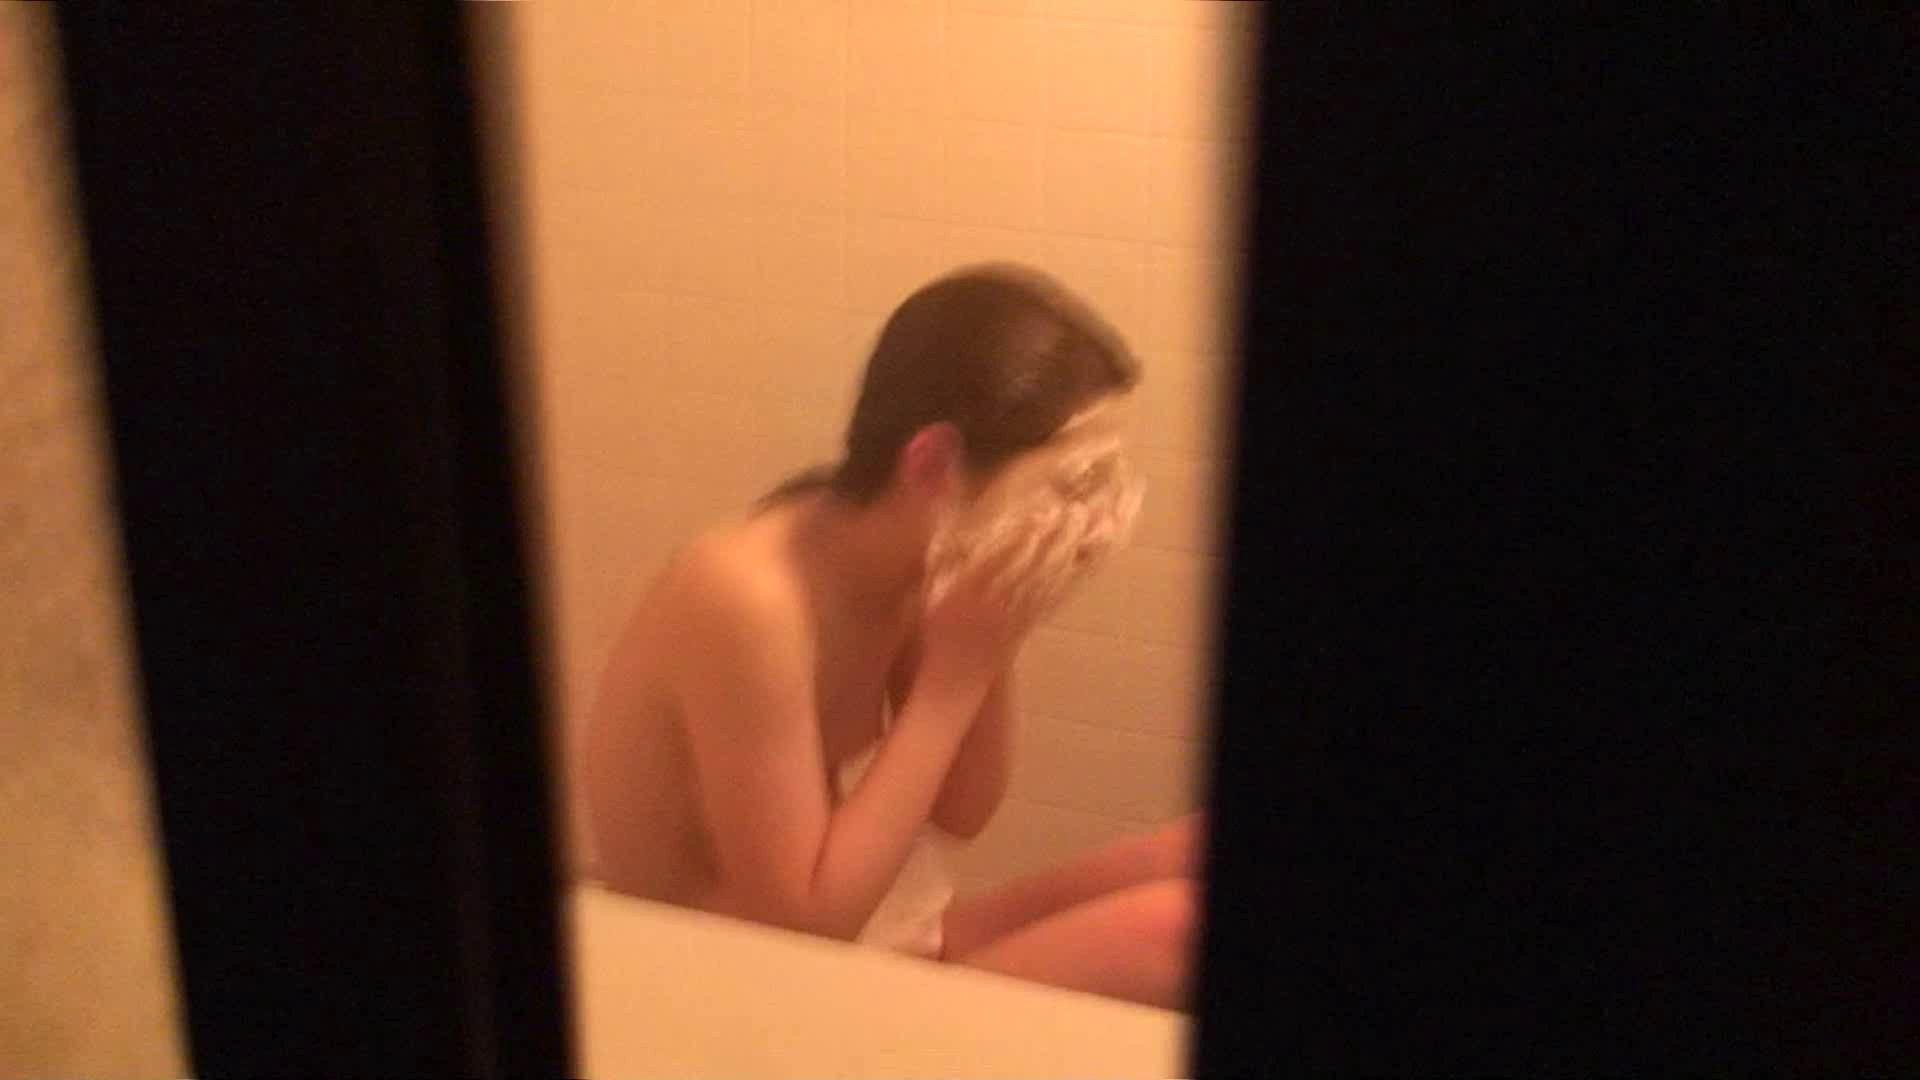 vol.02超可愛すぎる彼女の裸体をハイビジョンで!至近距離での眺め最高! むっちりガール アダルト動画キャプチャ 75枚 67